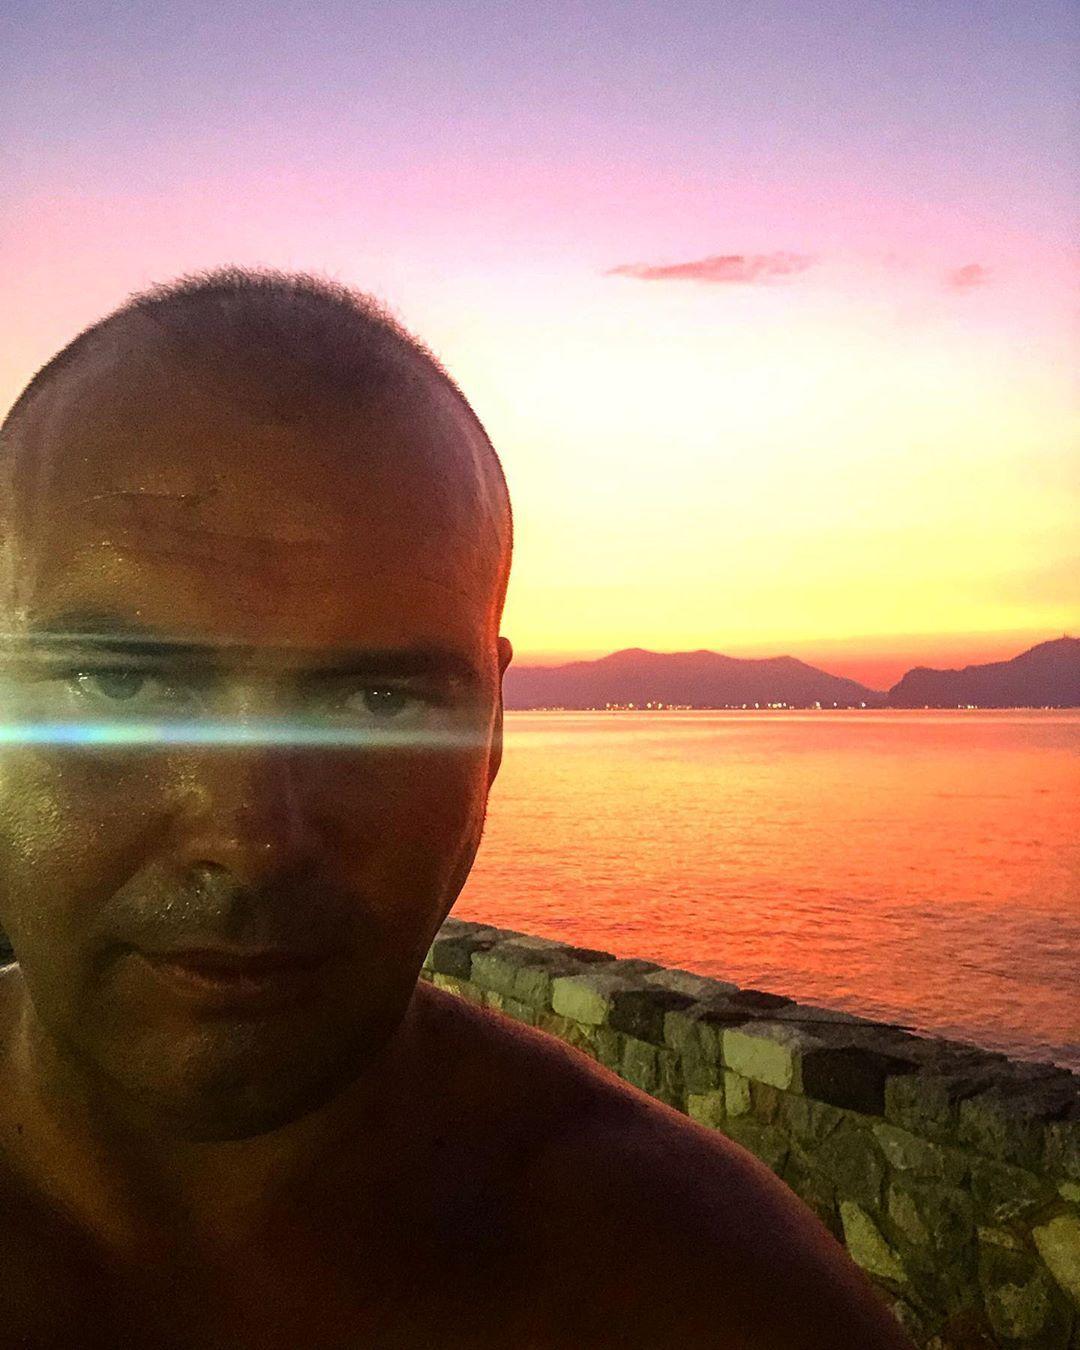 Rosso di sera .... #social #socialmediamarketing #art #travel #work #world ...